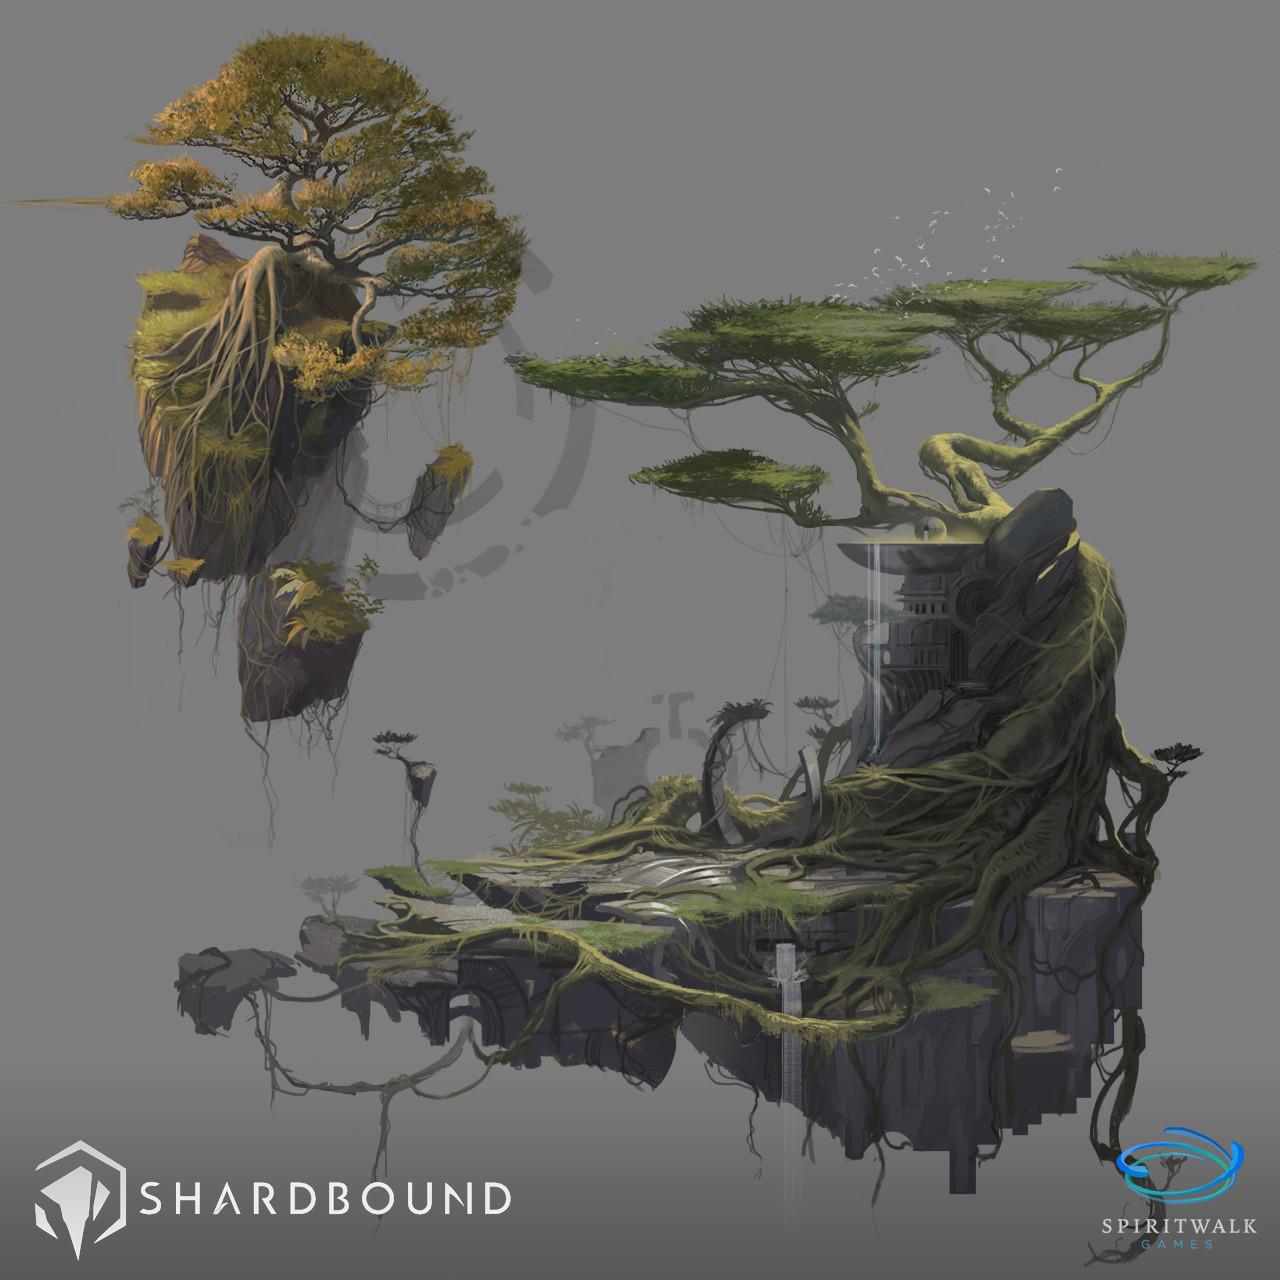 Trees Vis Dev - Shardbound